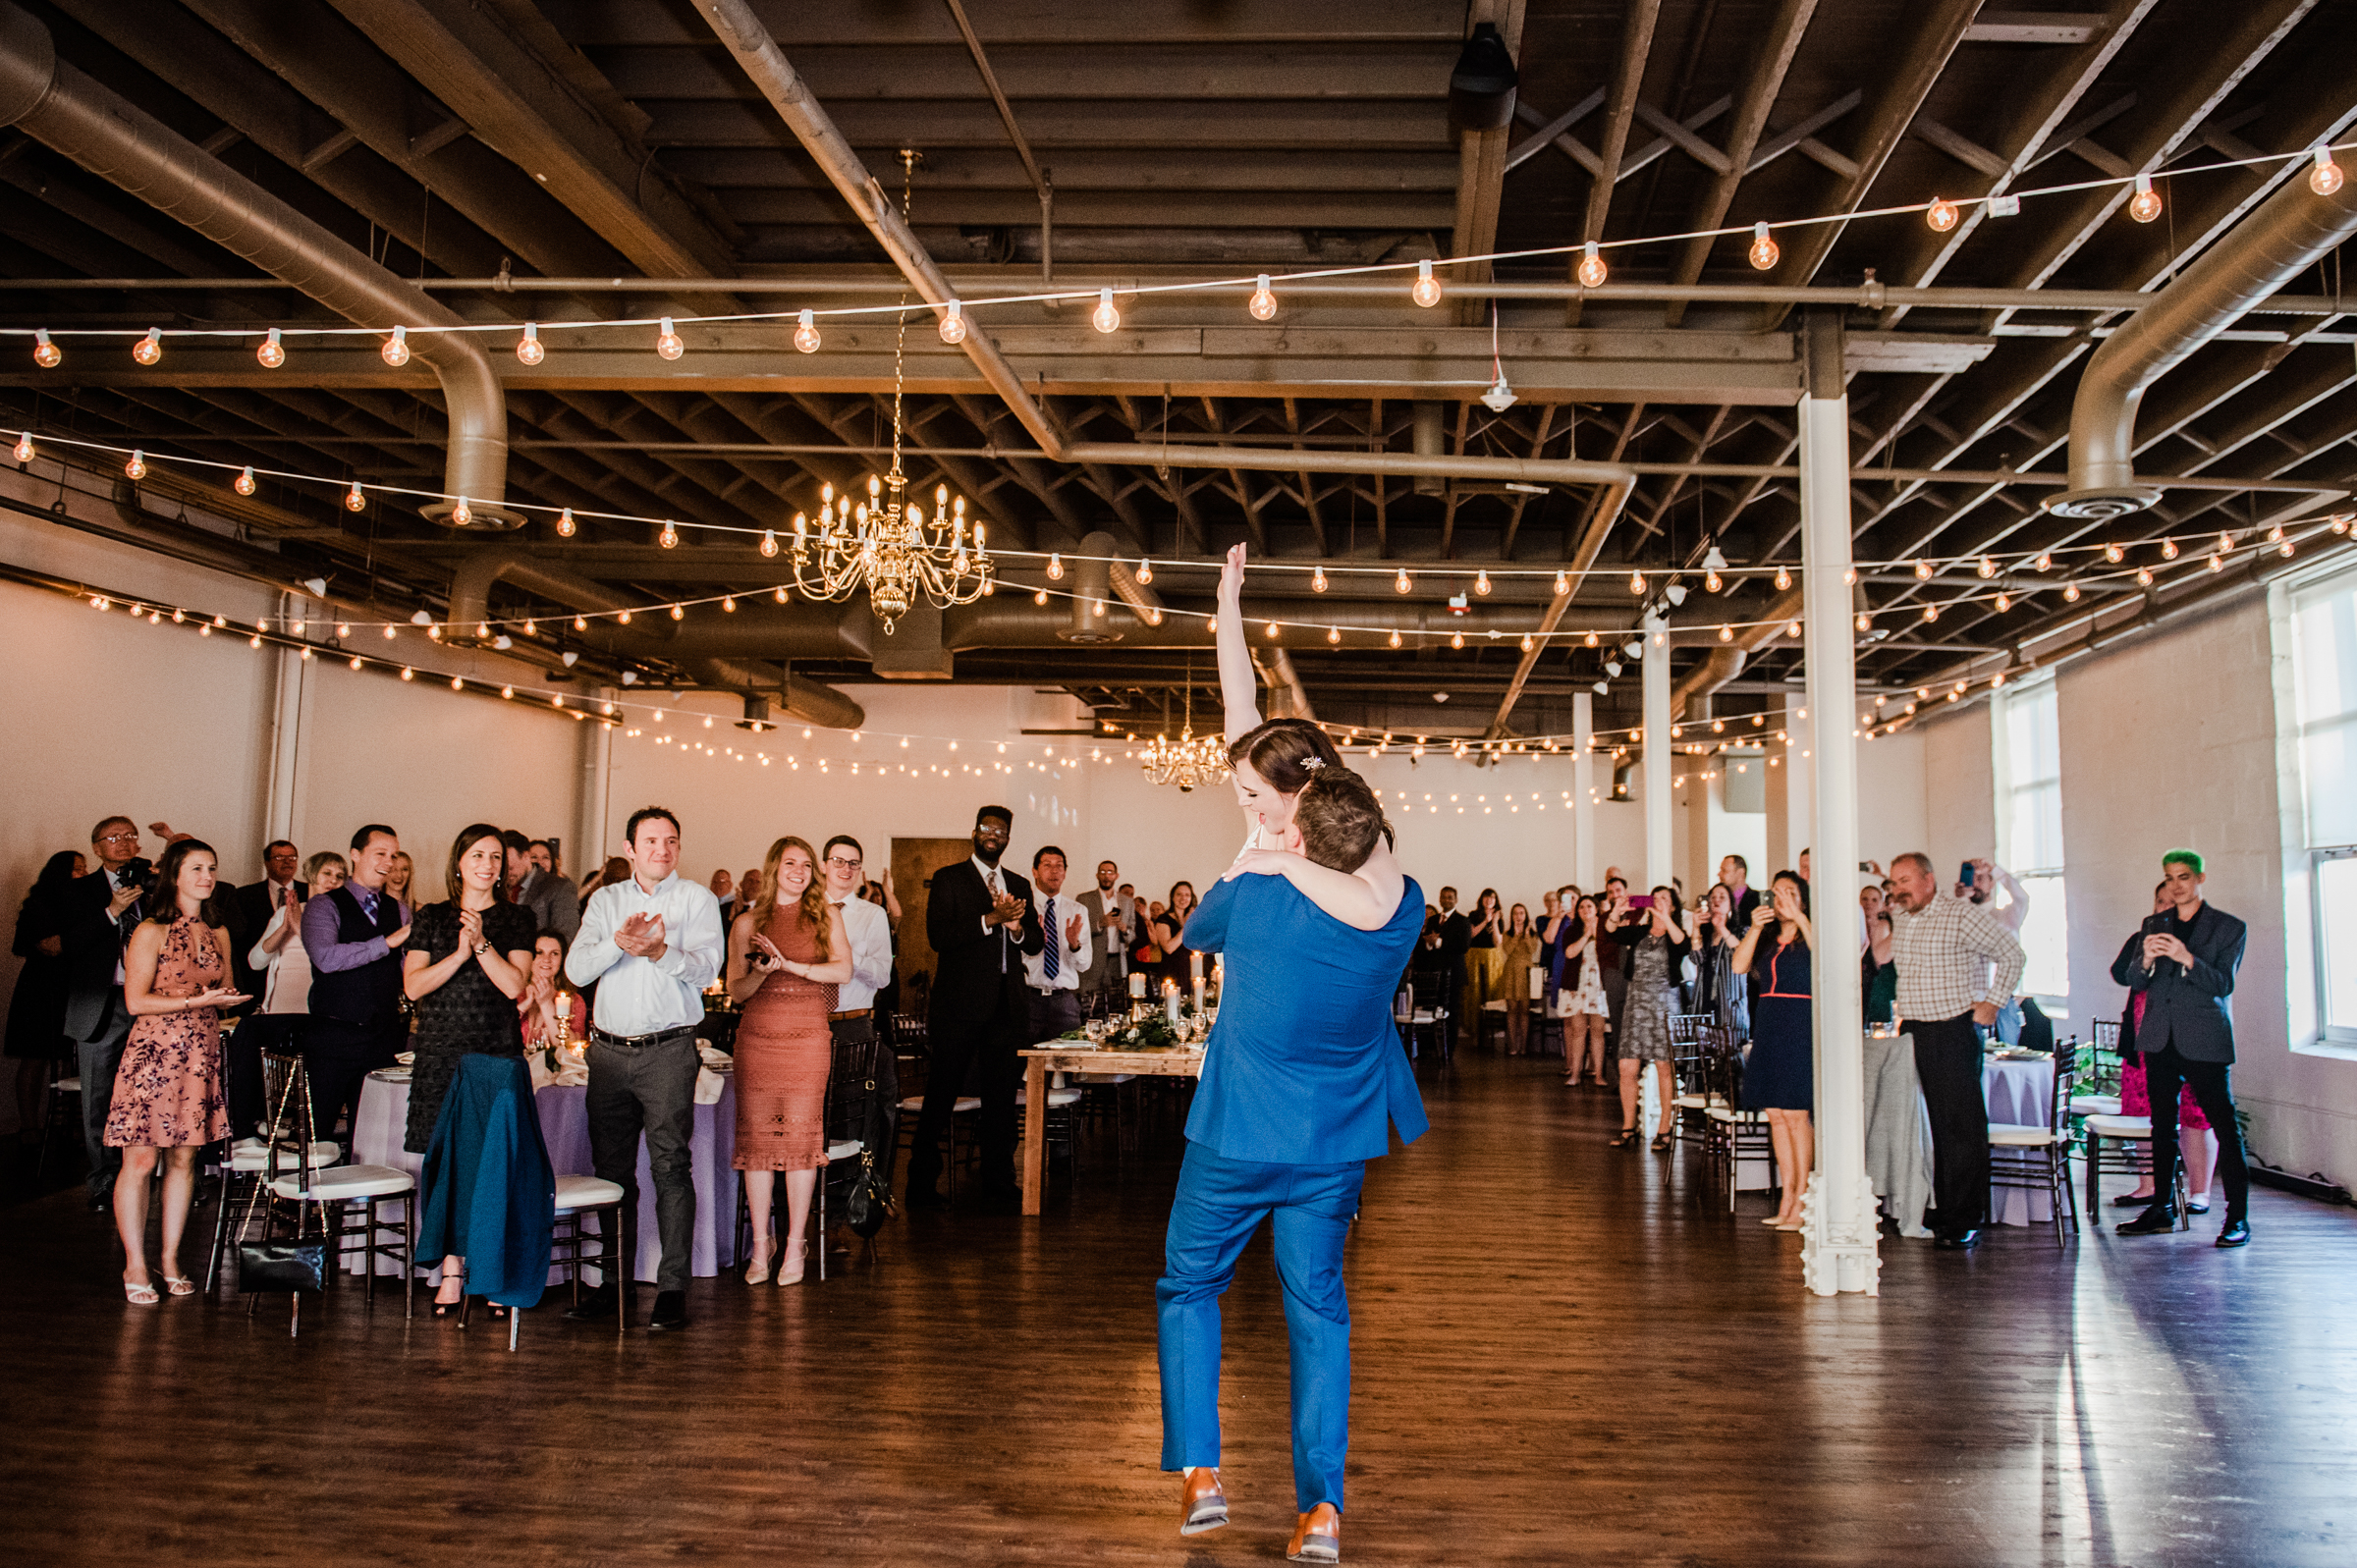 The_Arbor_LoftRochester_Wedding_JILL_STUDIO_Rochester_NY_Photographer_185147.jpg